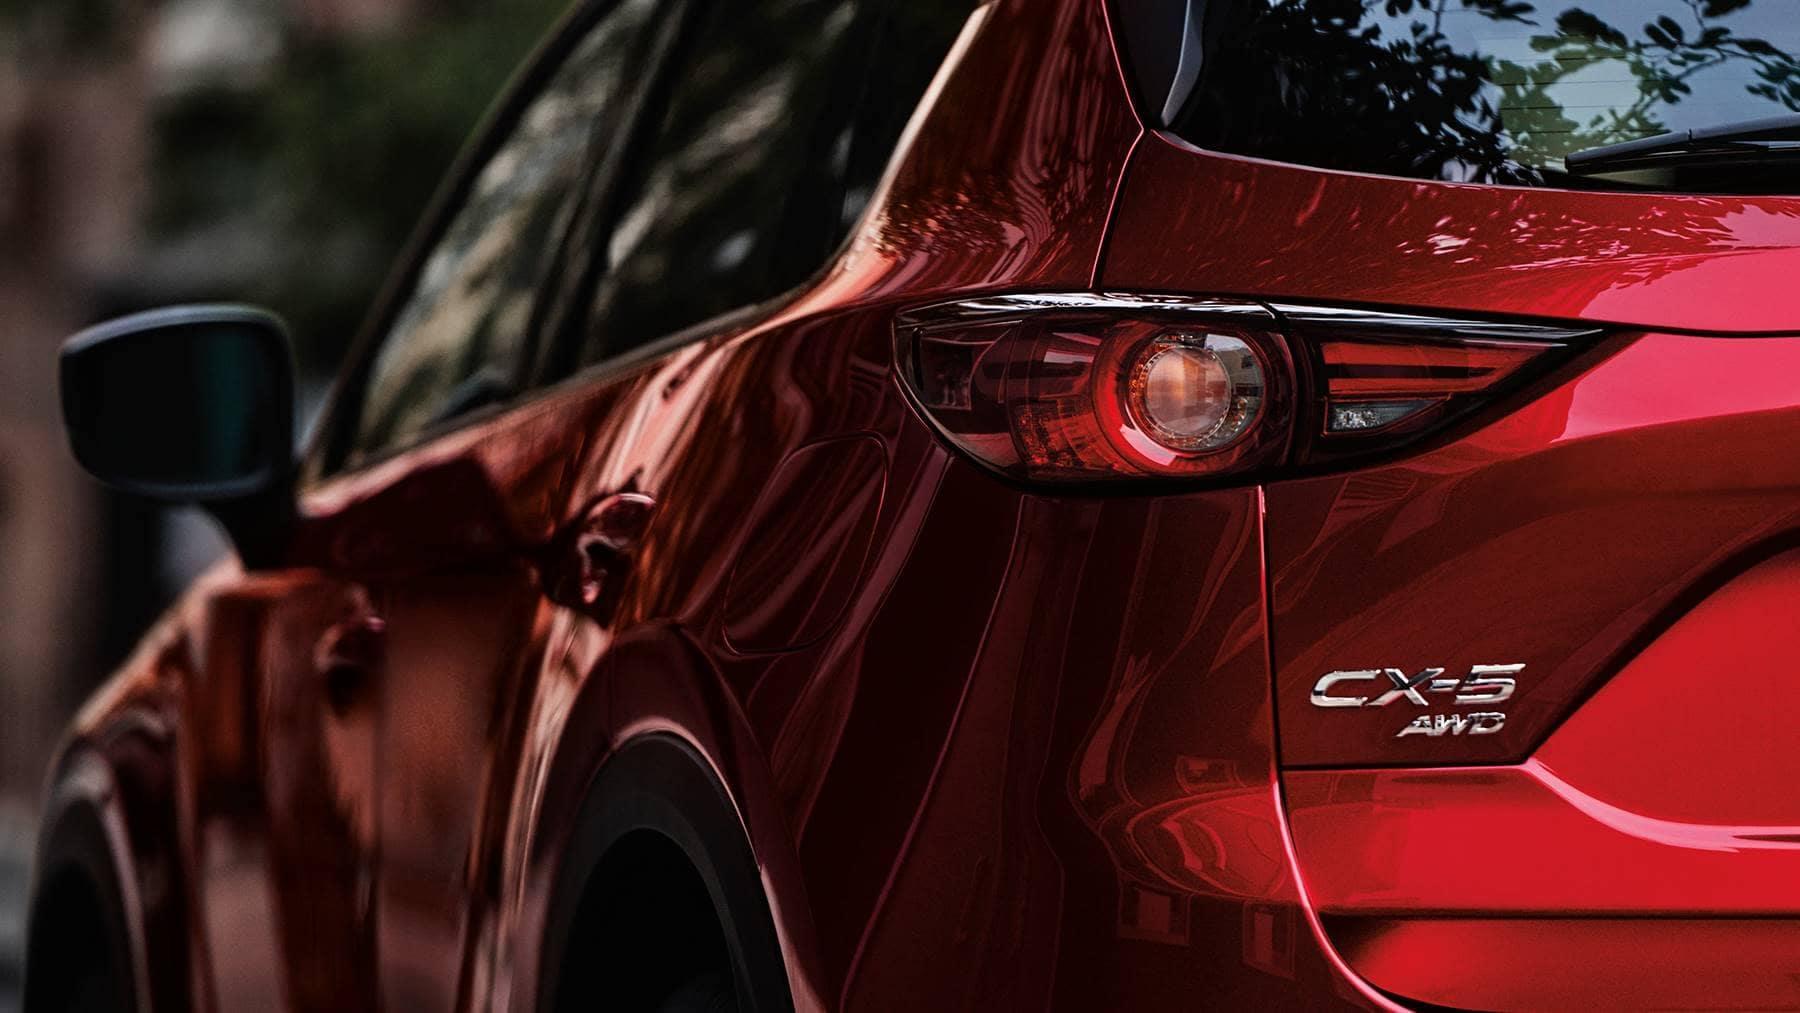 2018 Mazda CX-5 AWD